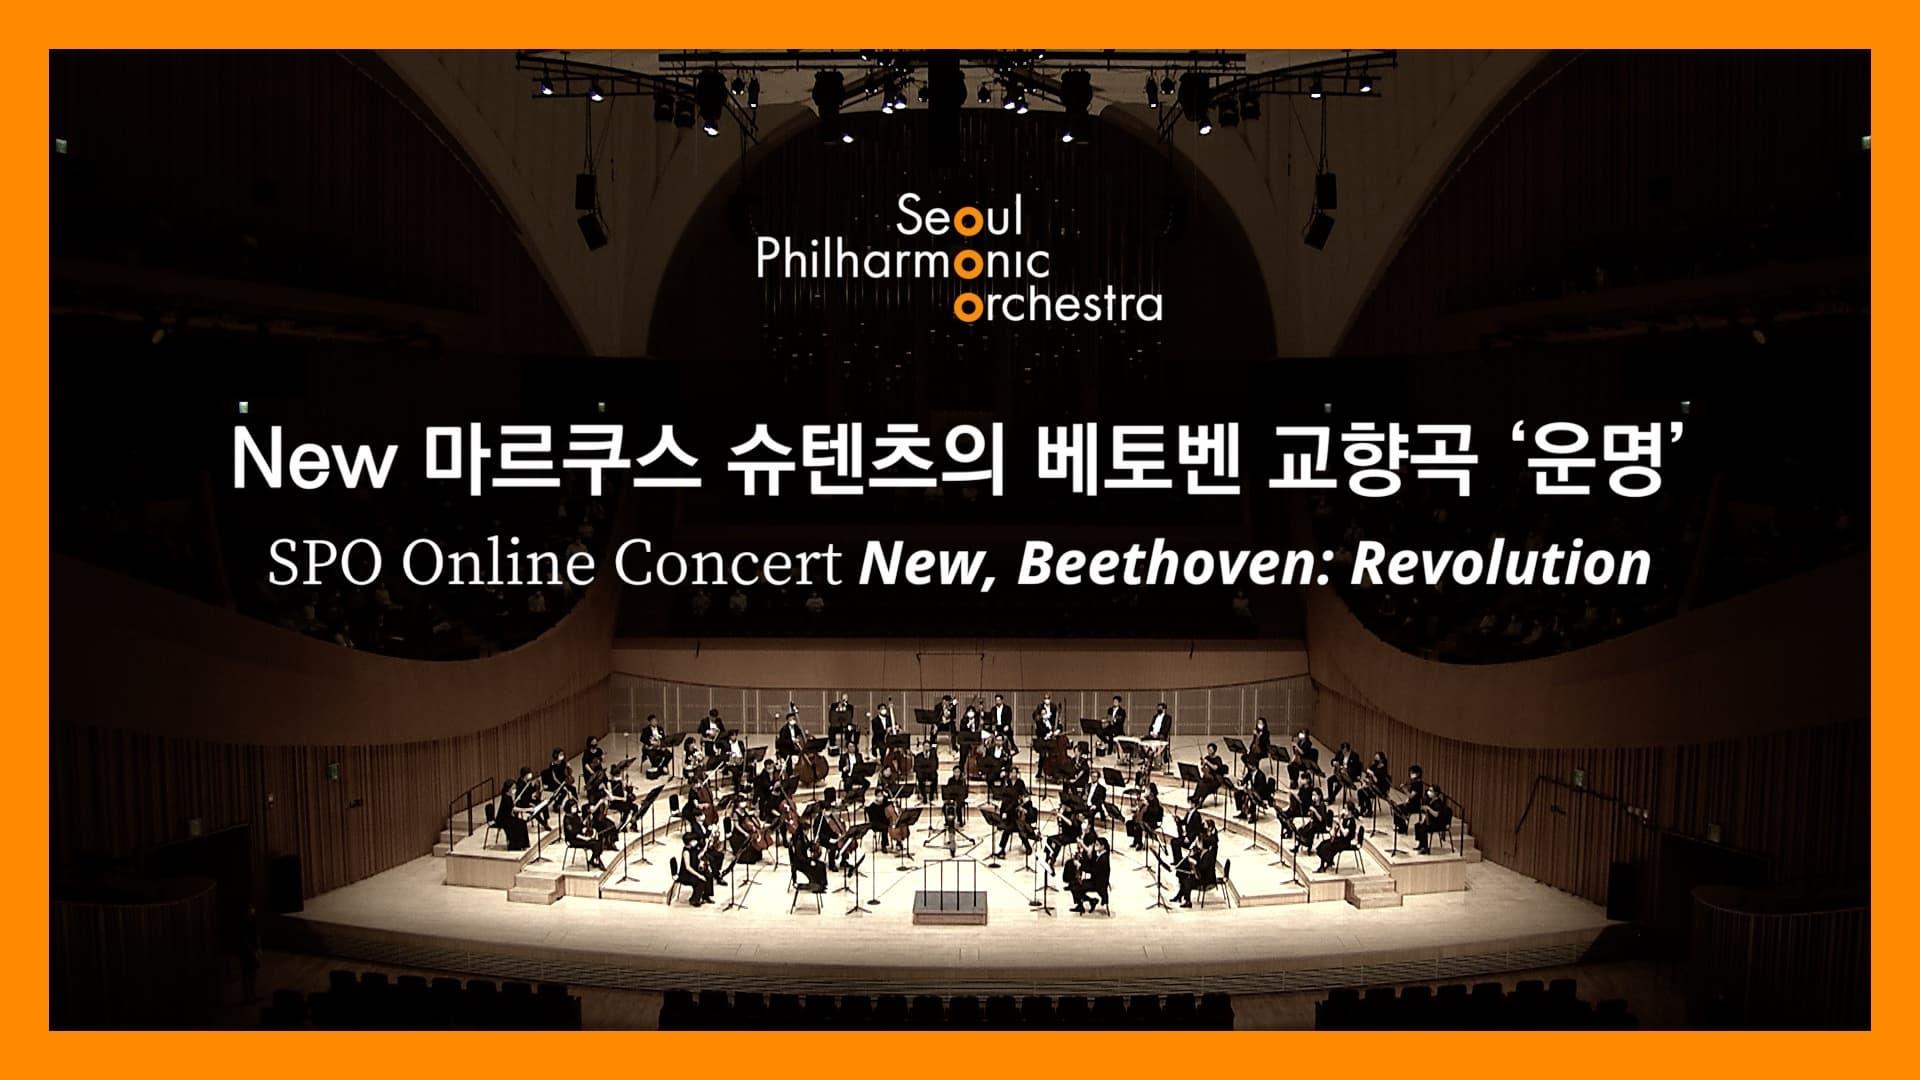 New 마르쿠스 슈텐츠의 베토벤 교향곡 운명